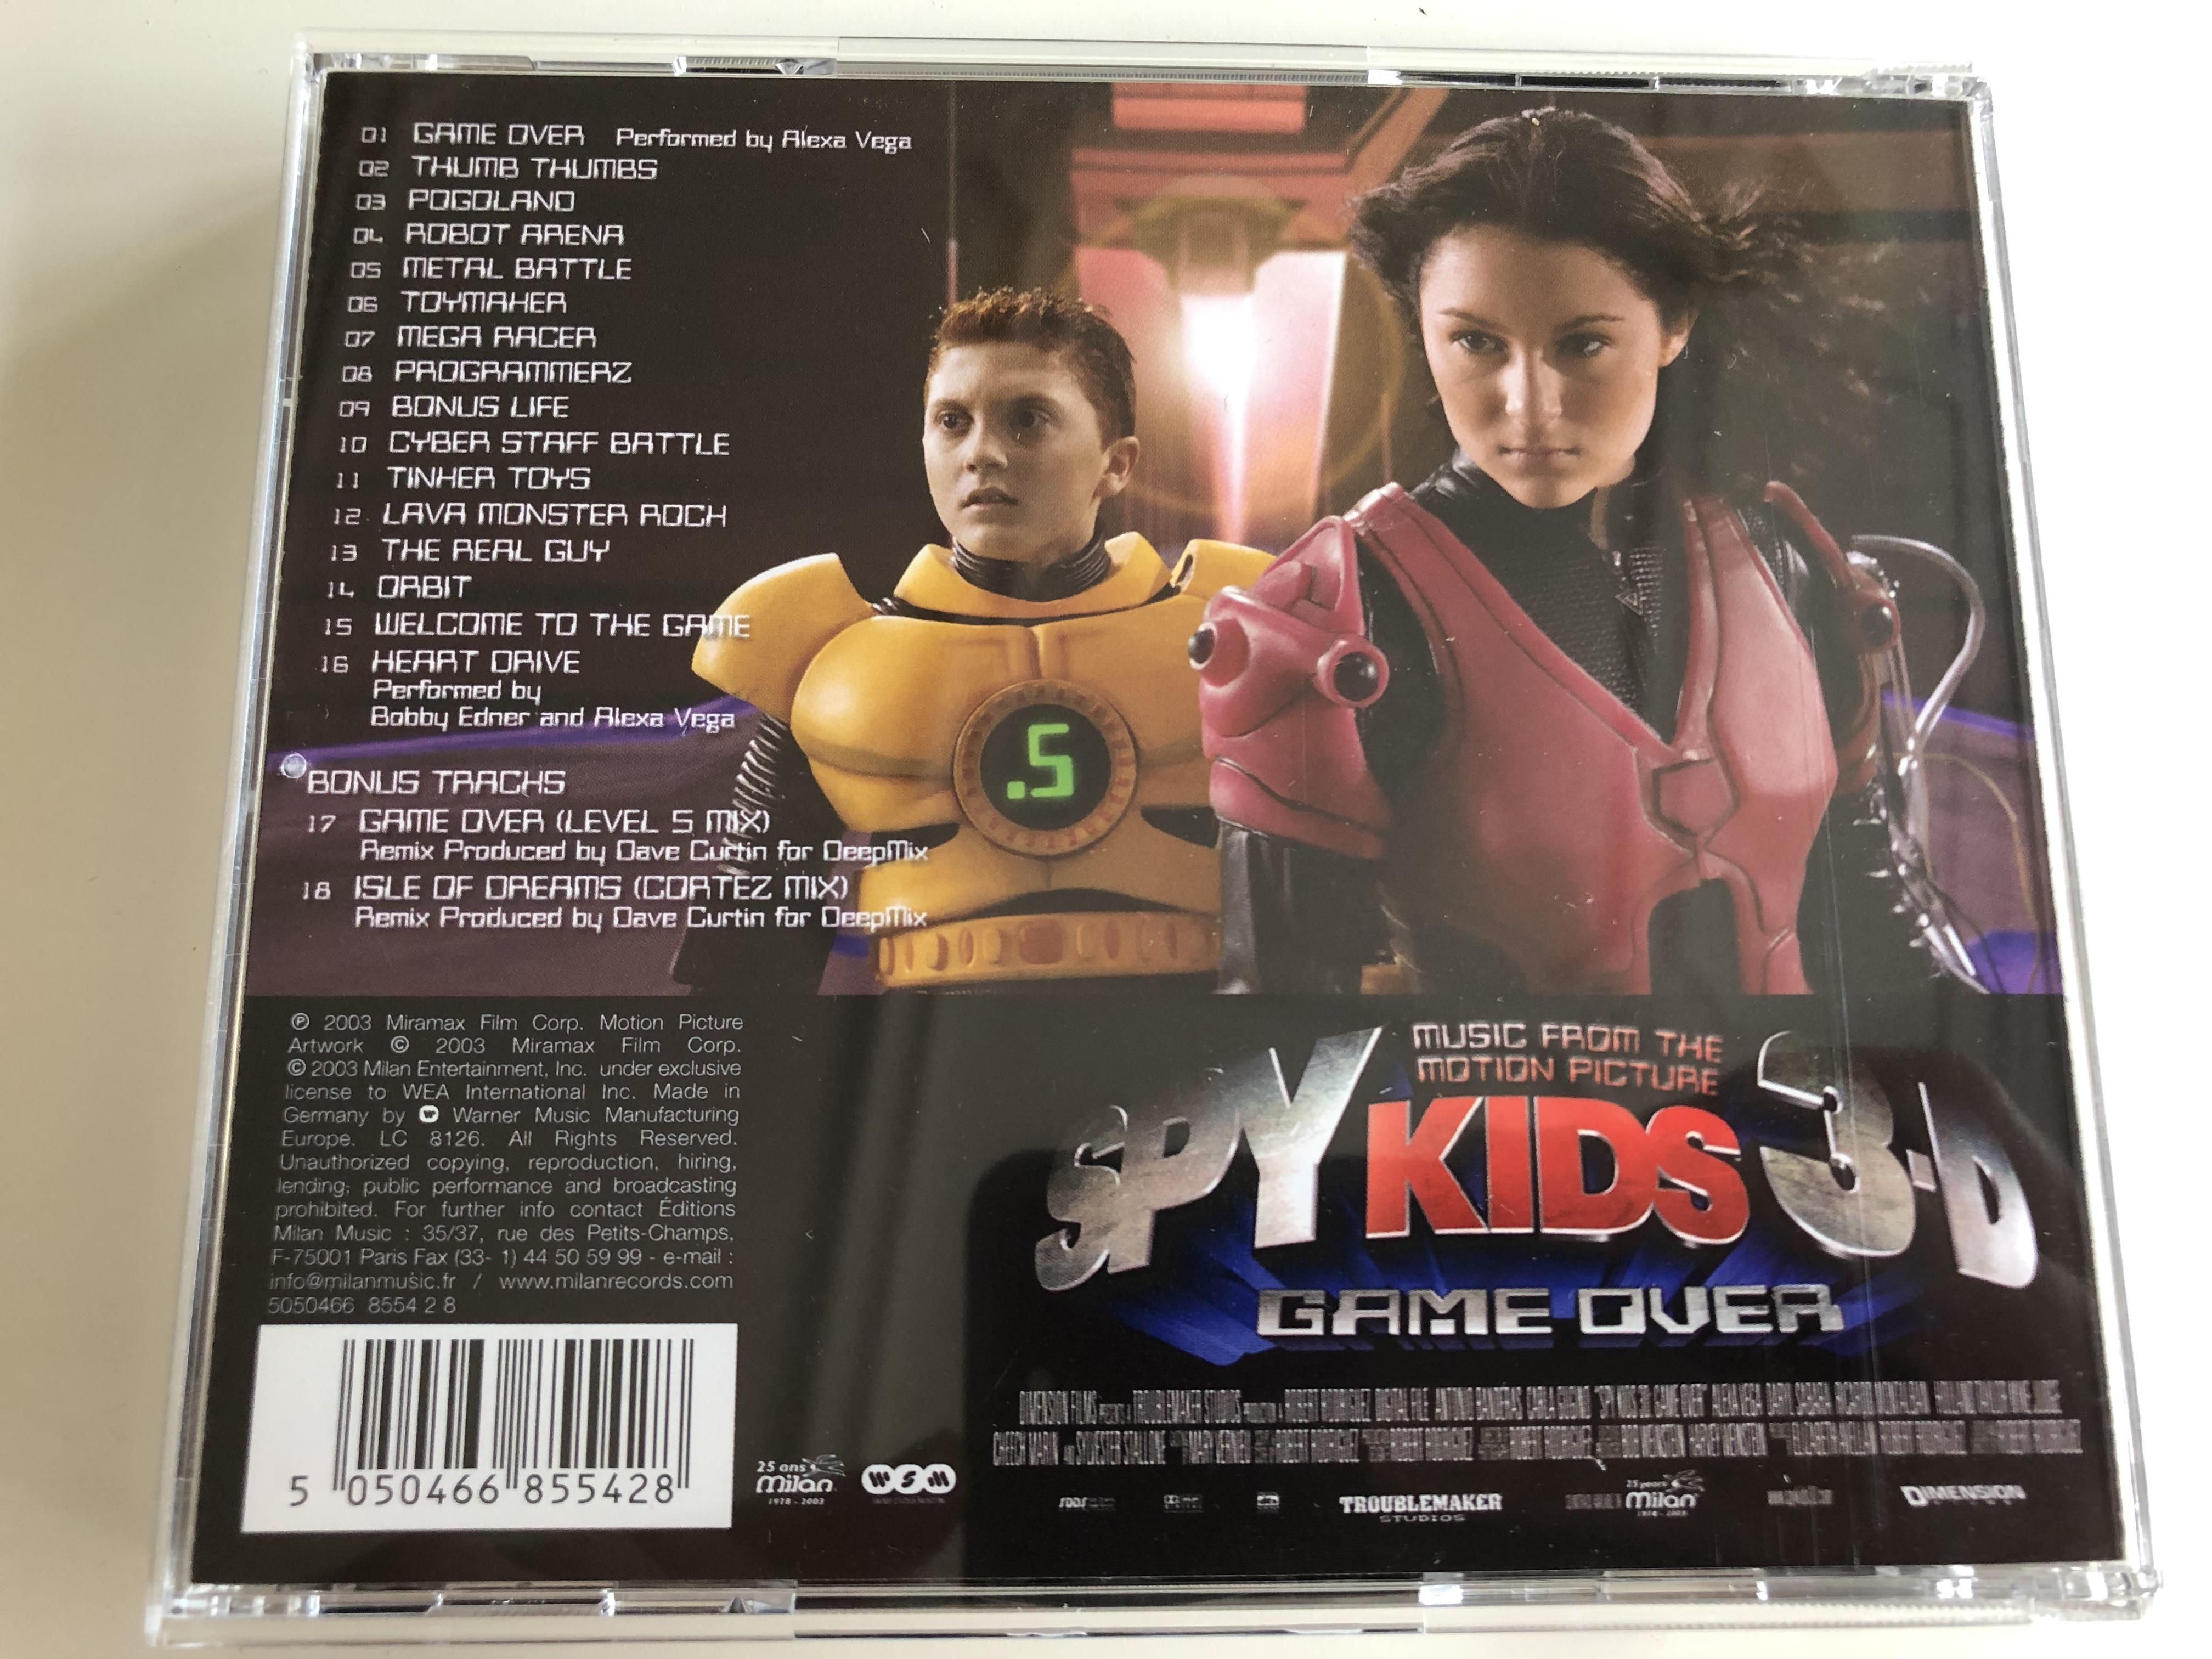 spy-kids-3d-game-overimg-2676.jpg